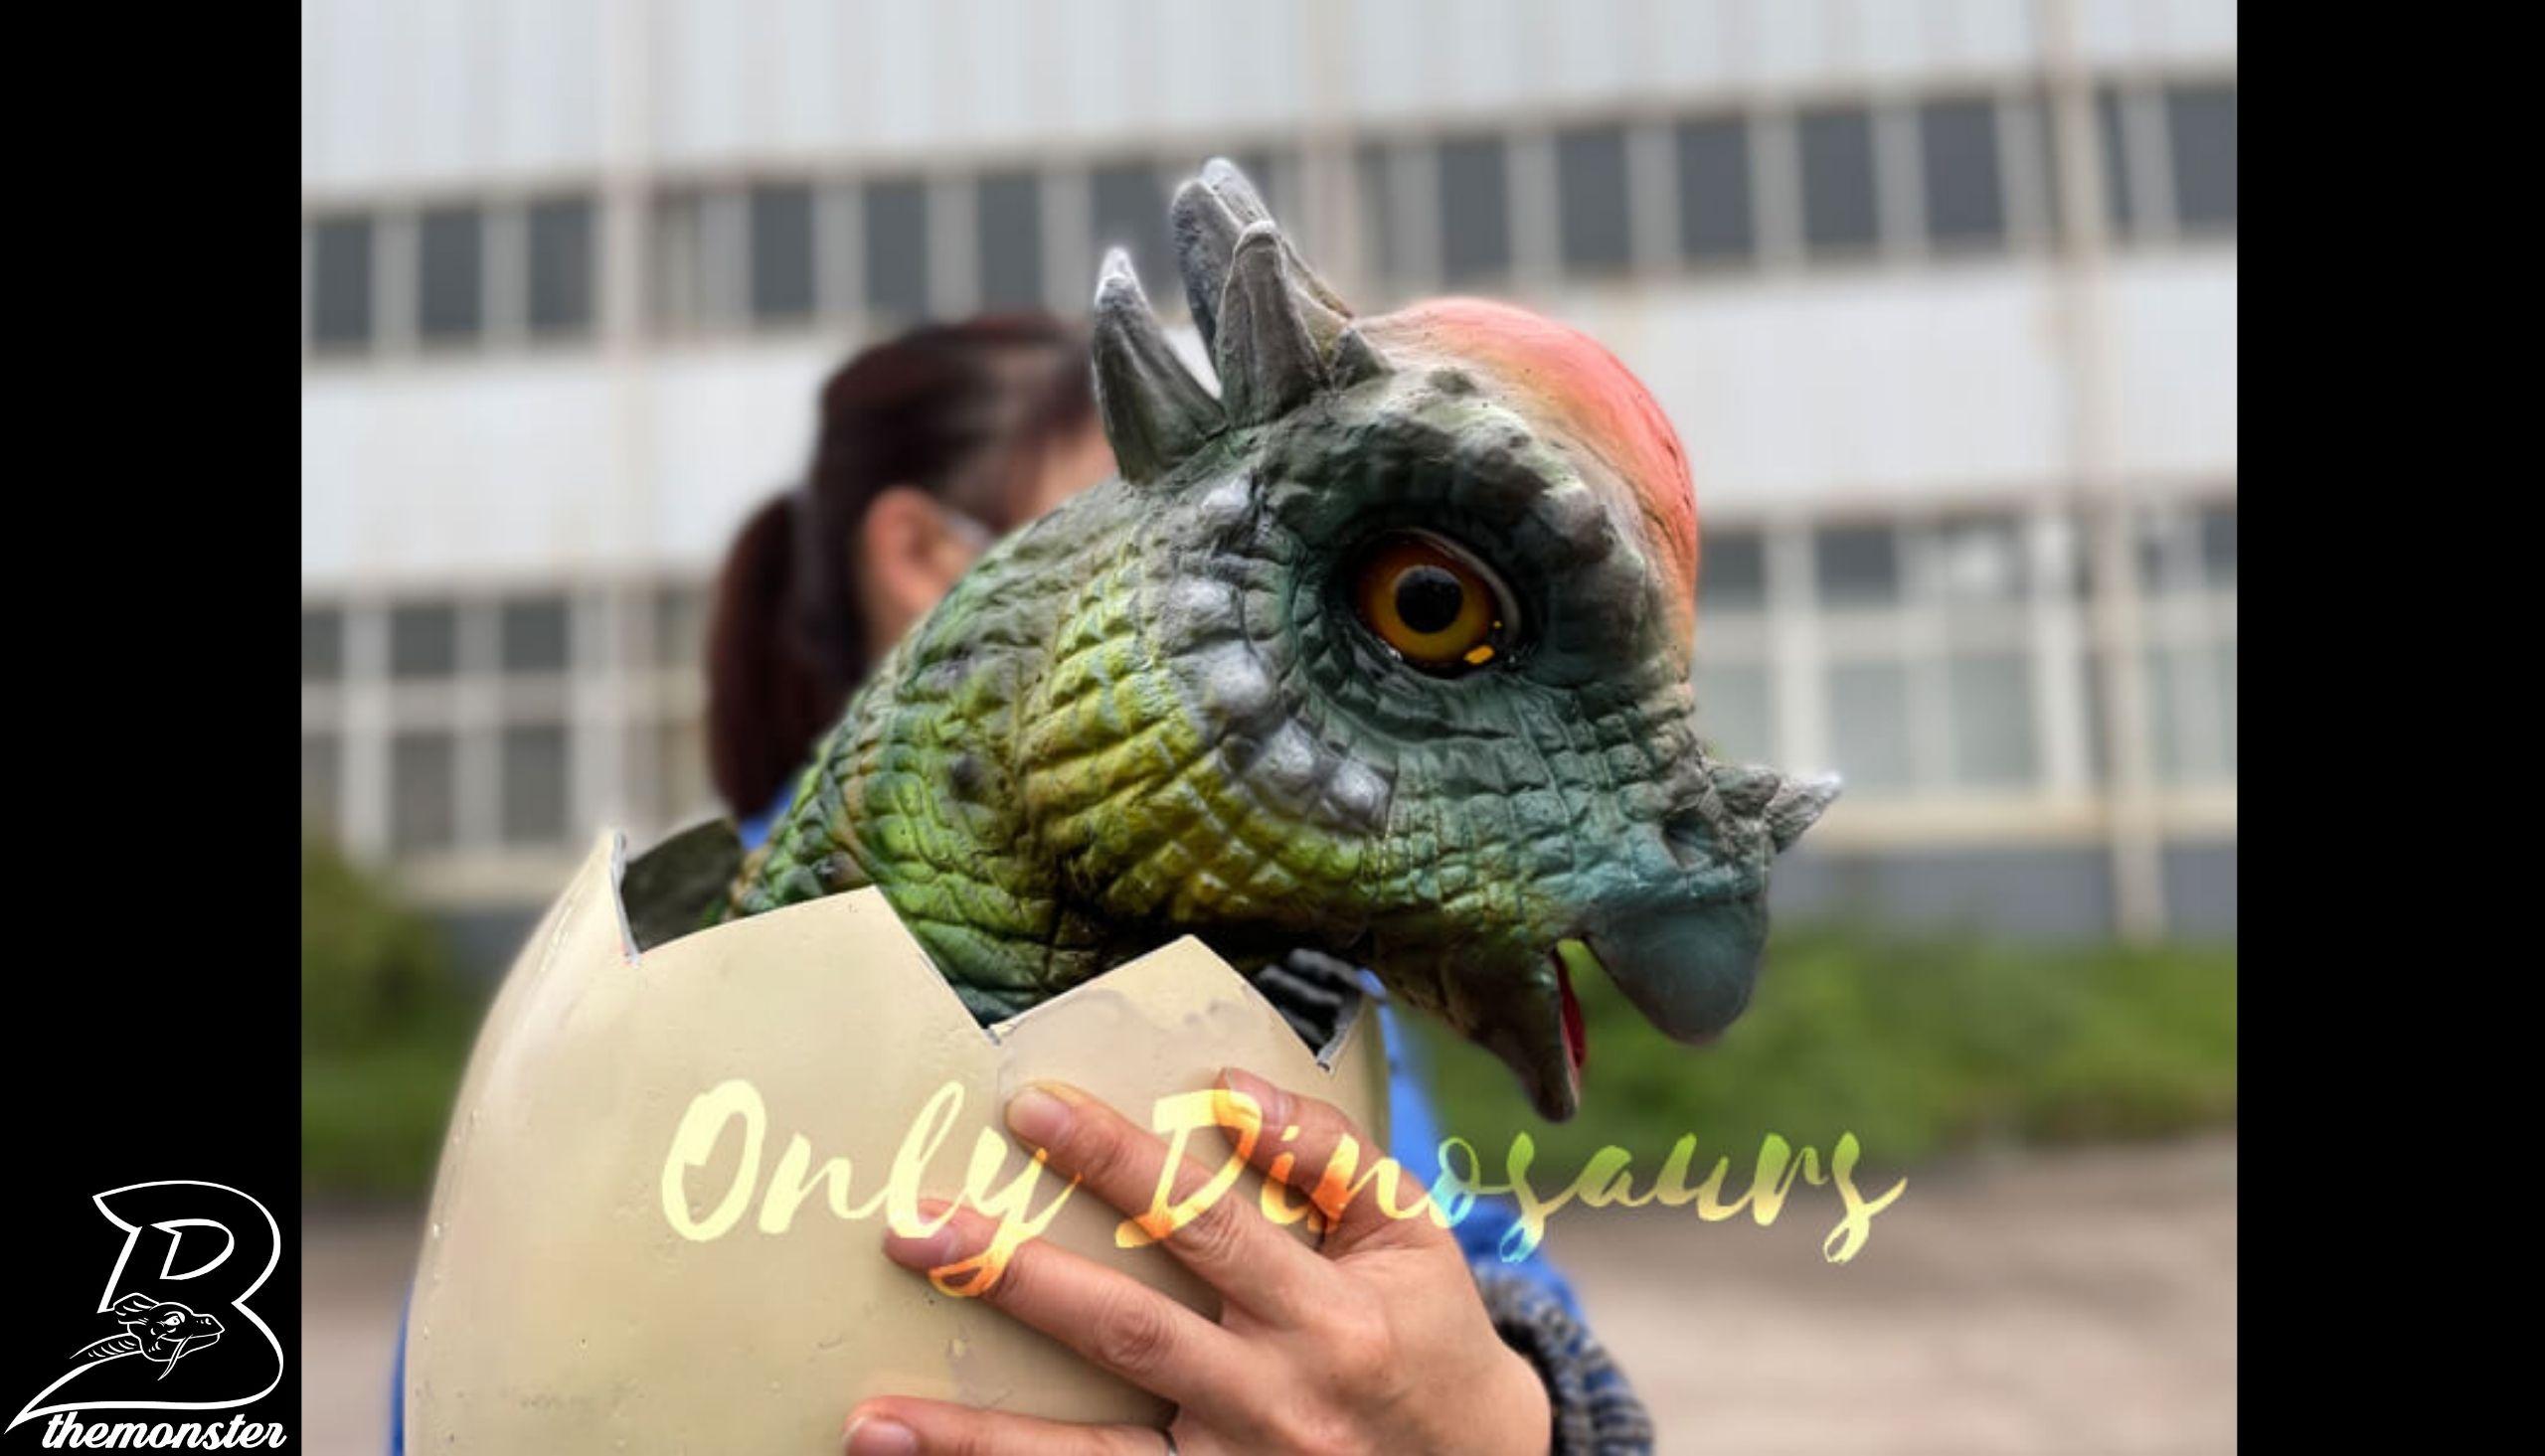 Attractive Pachycephalosaurus in Hatching Egg Hand Puppet in vendita sul Bthemonster.com